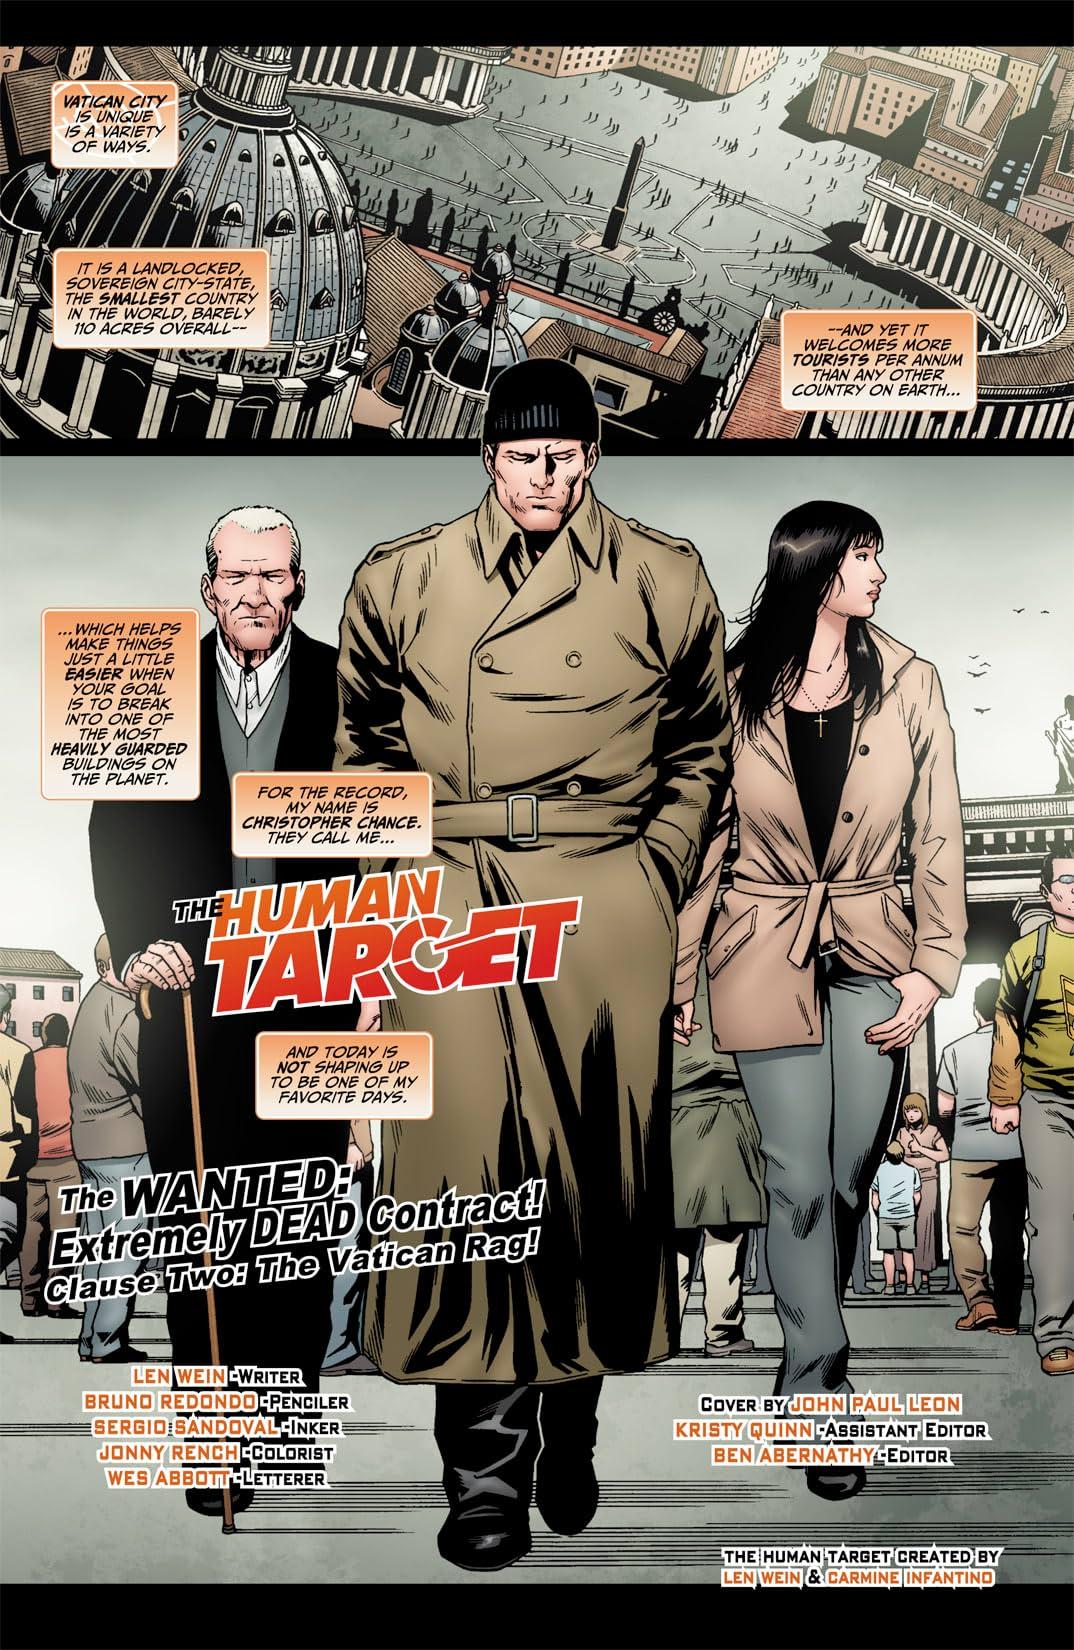 Human Target (2010) #2 (of 6)